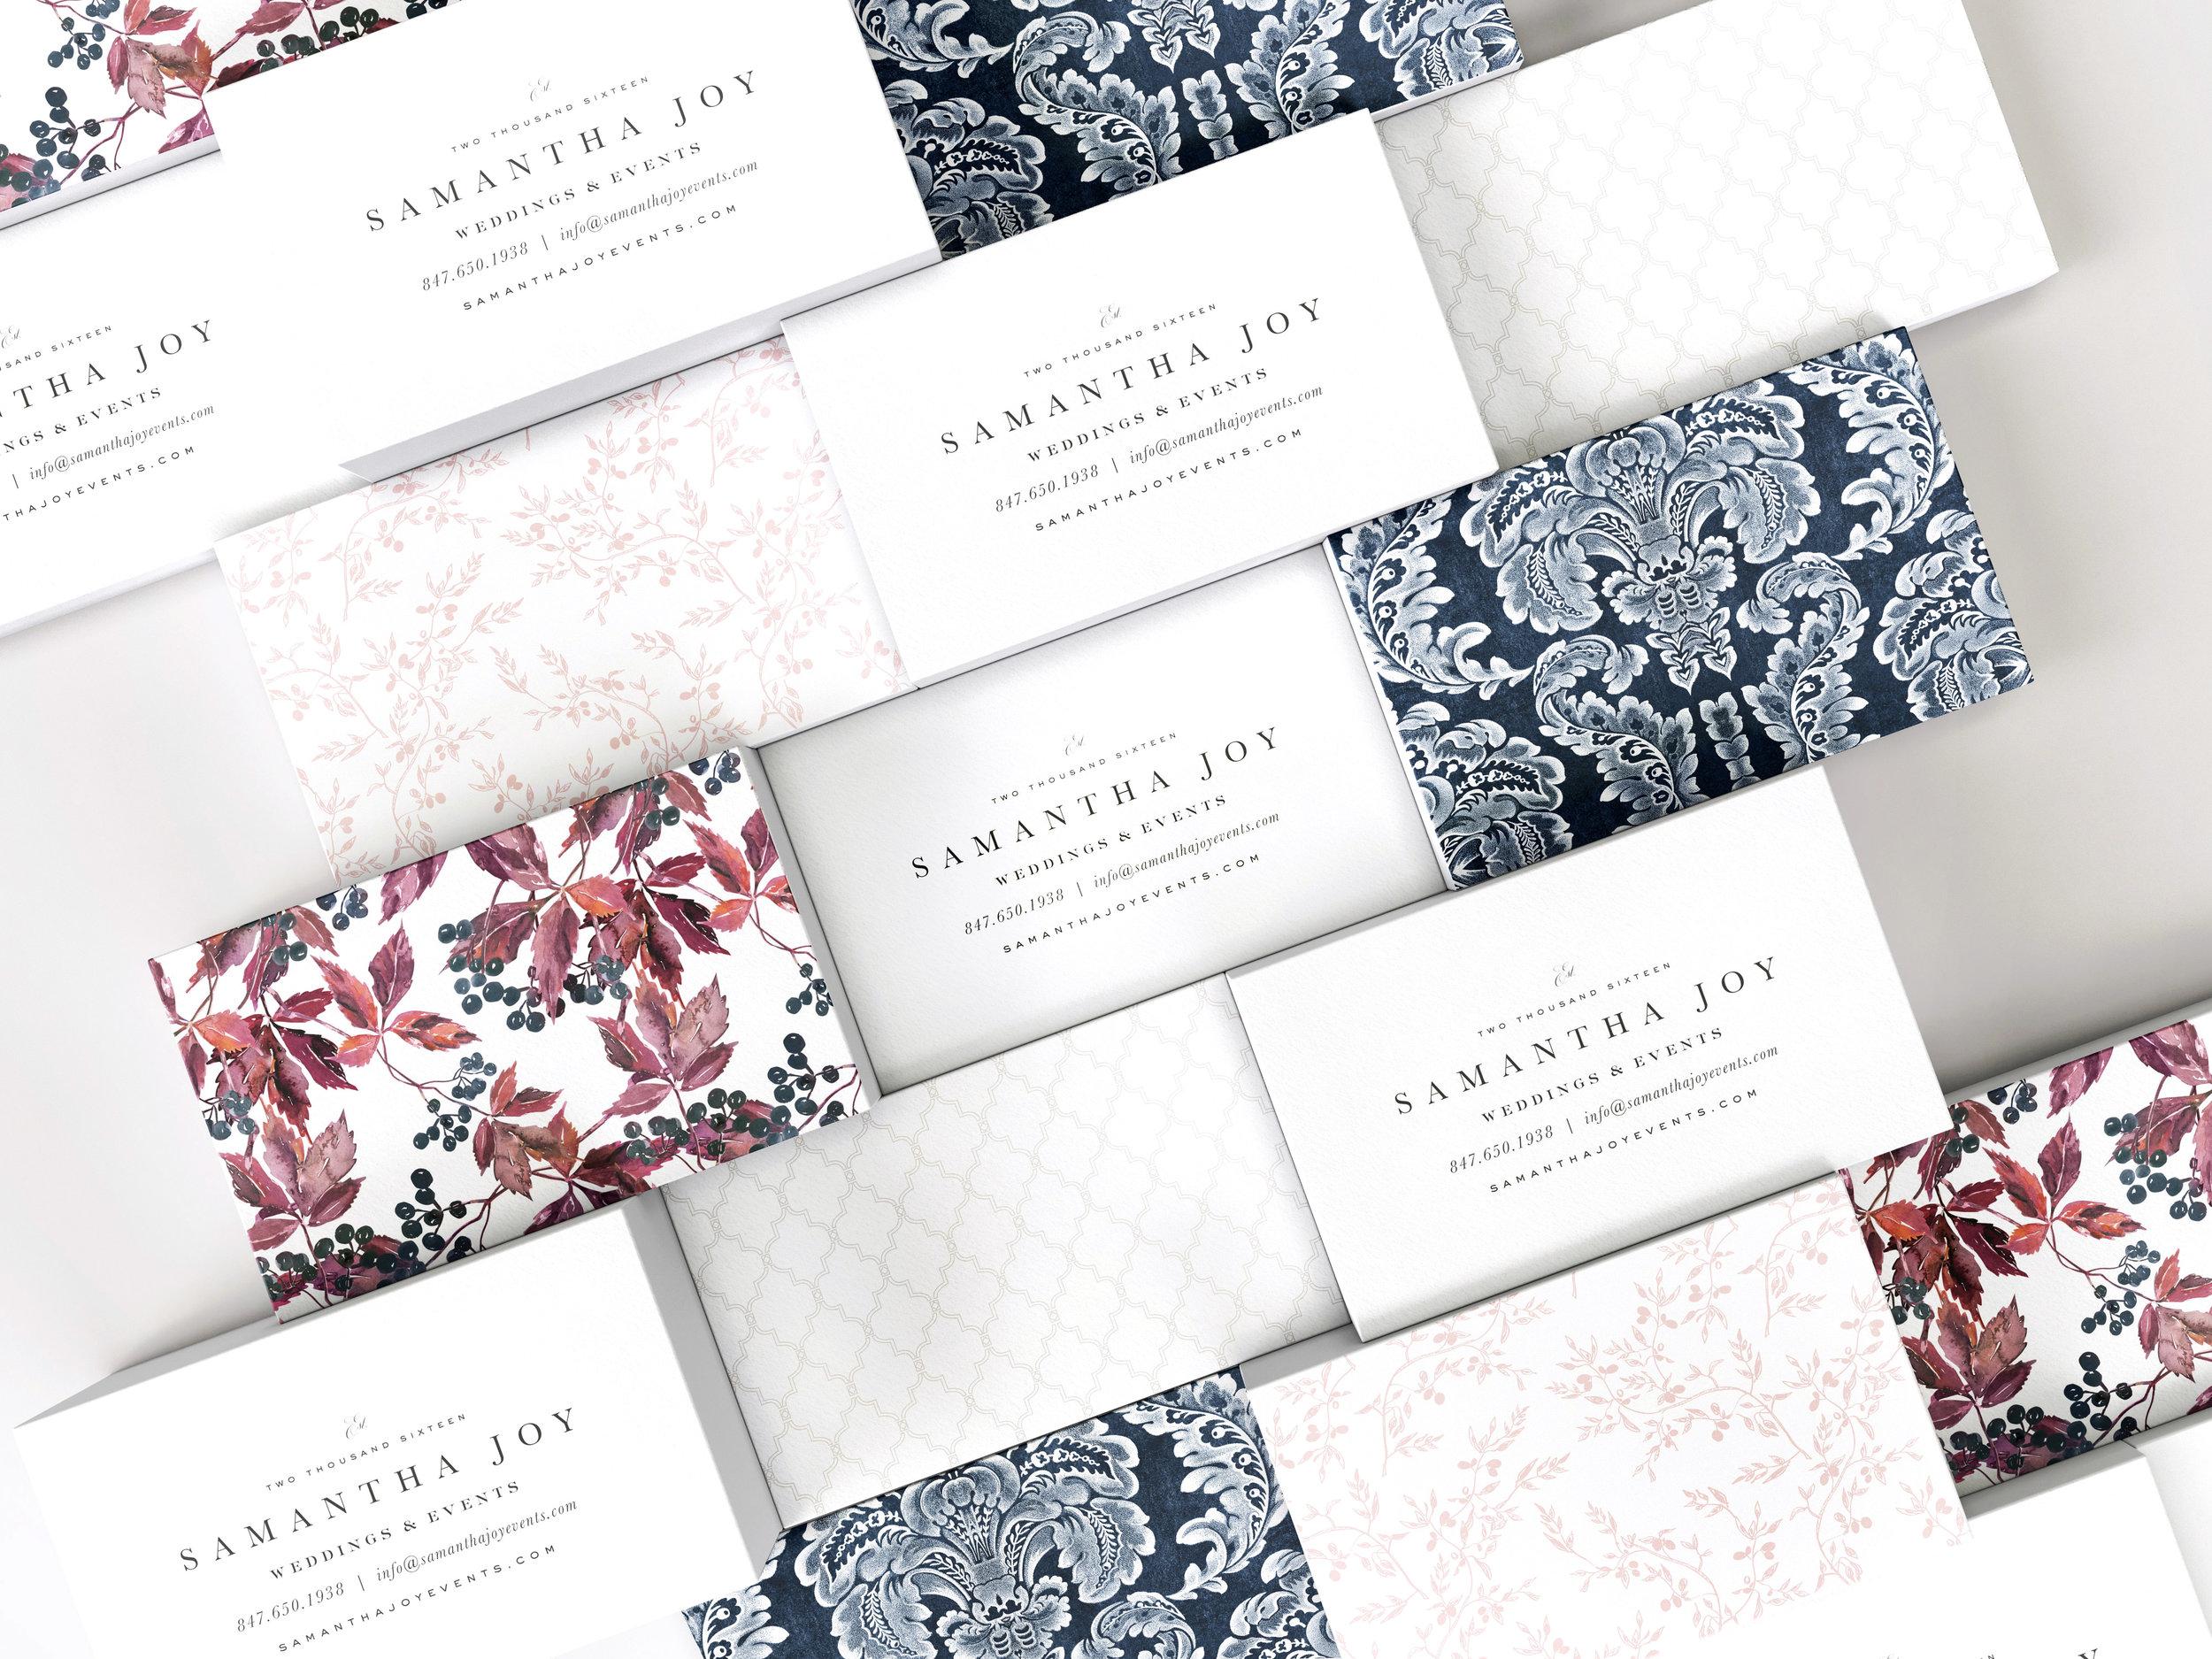 Samantha-Joy-Multi-Pattern-Business-Cards.jpg